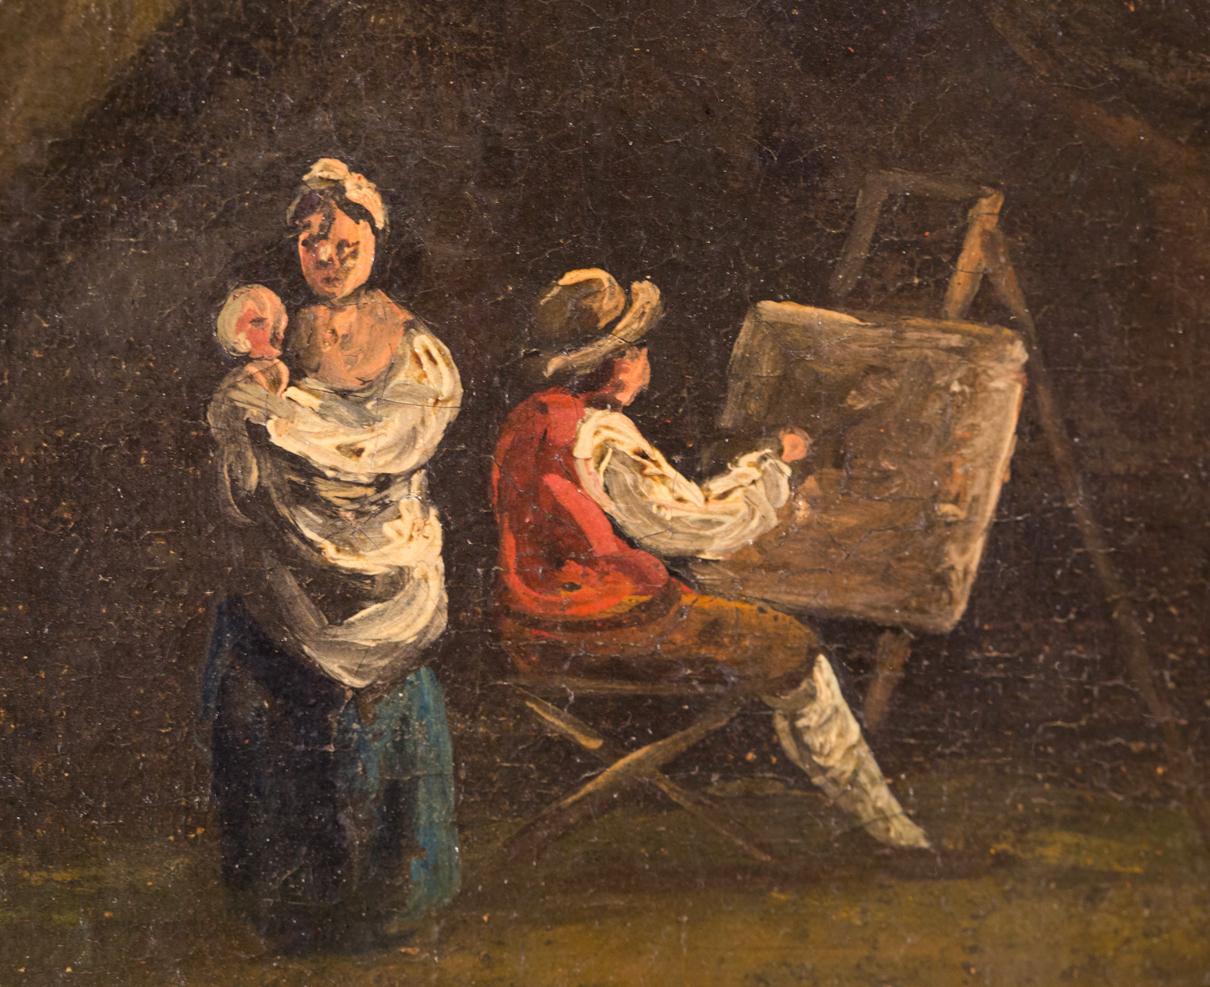 Wilson - Artists family detail